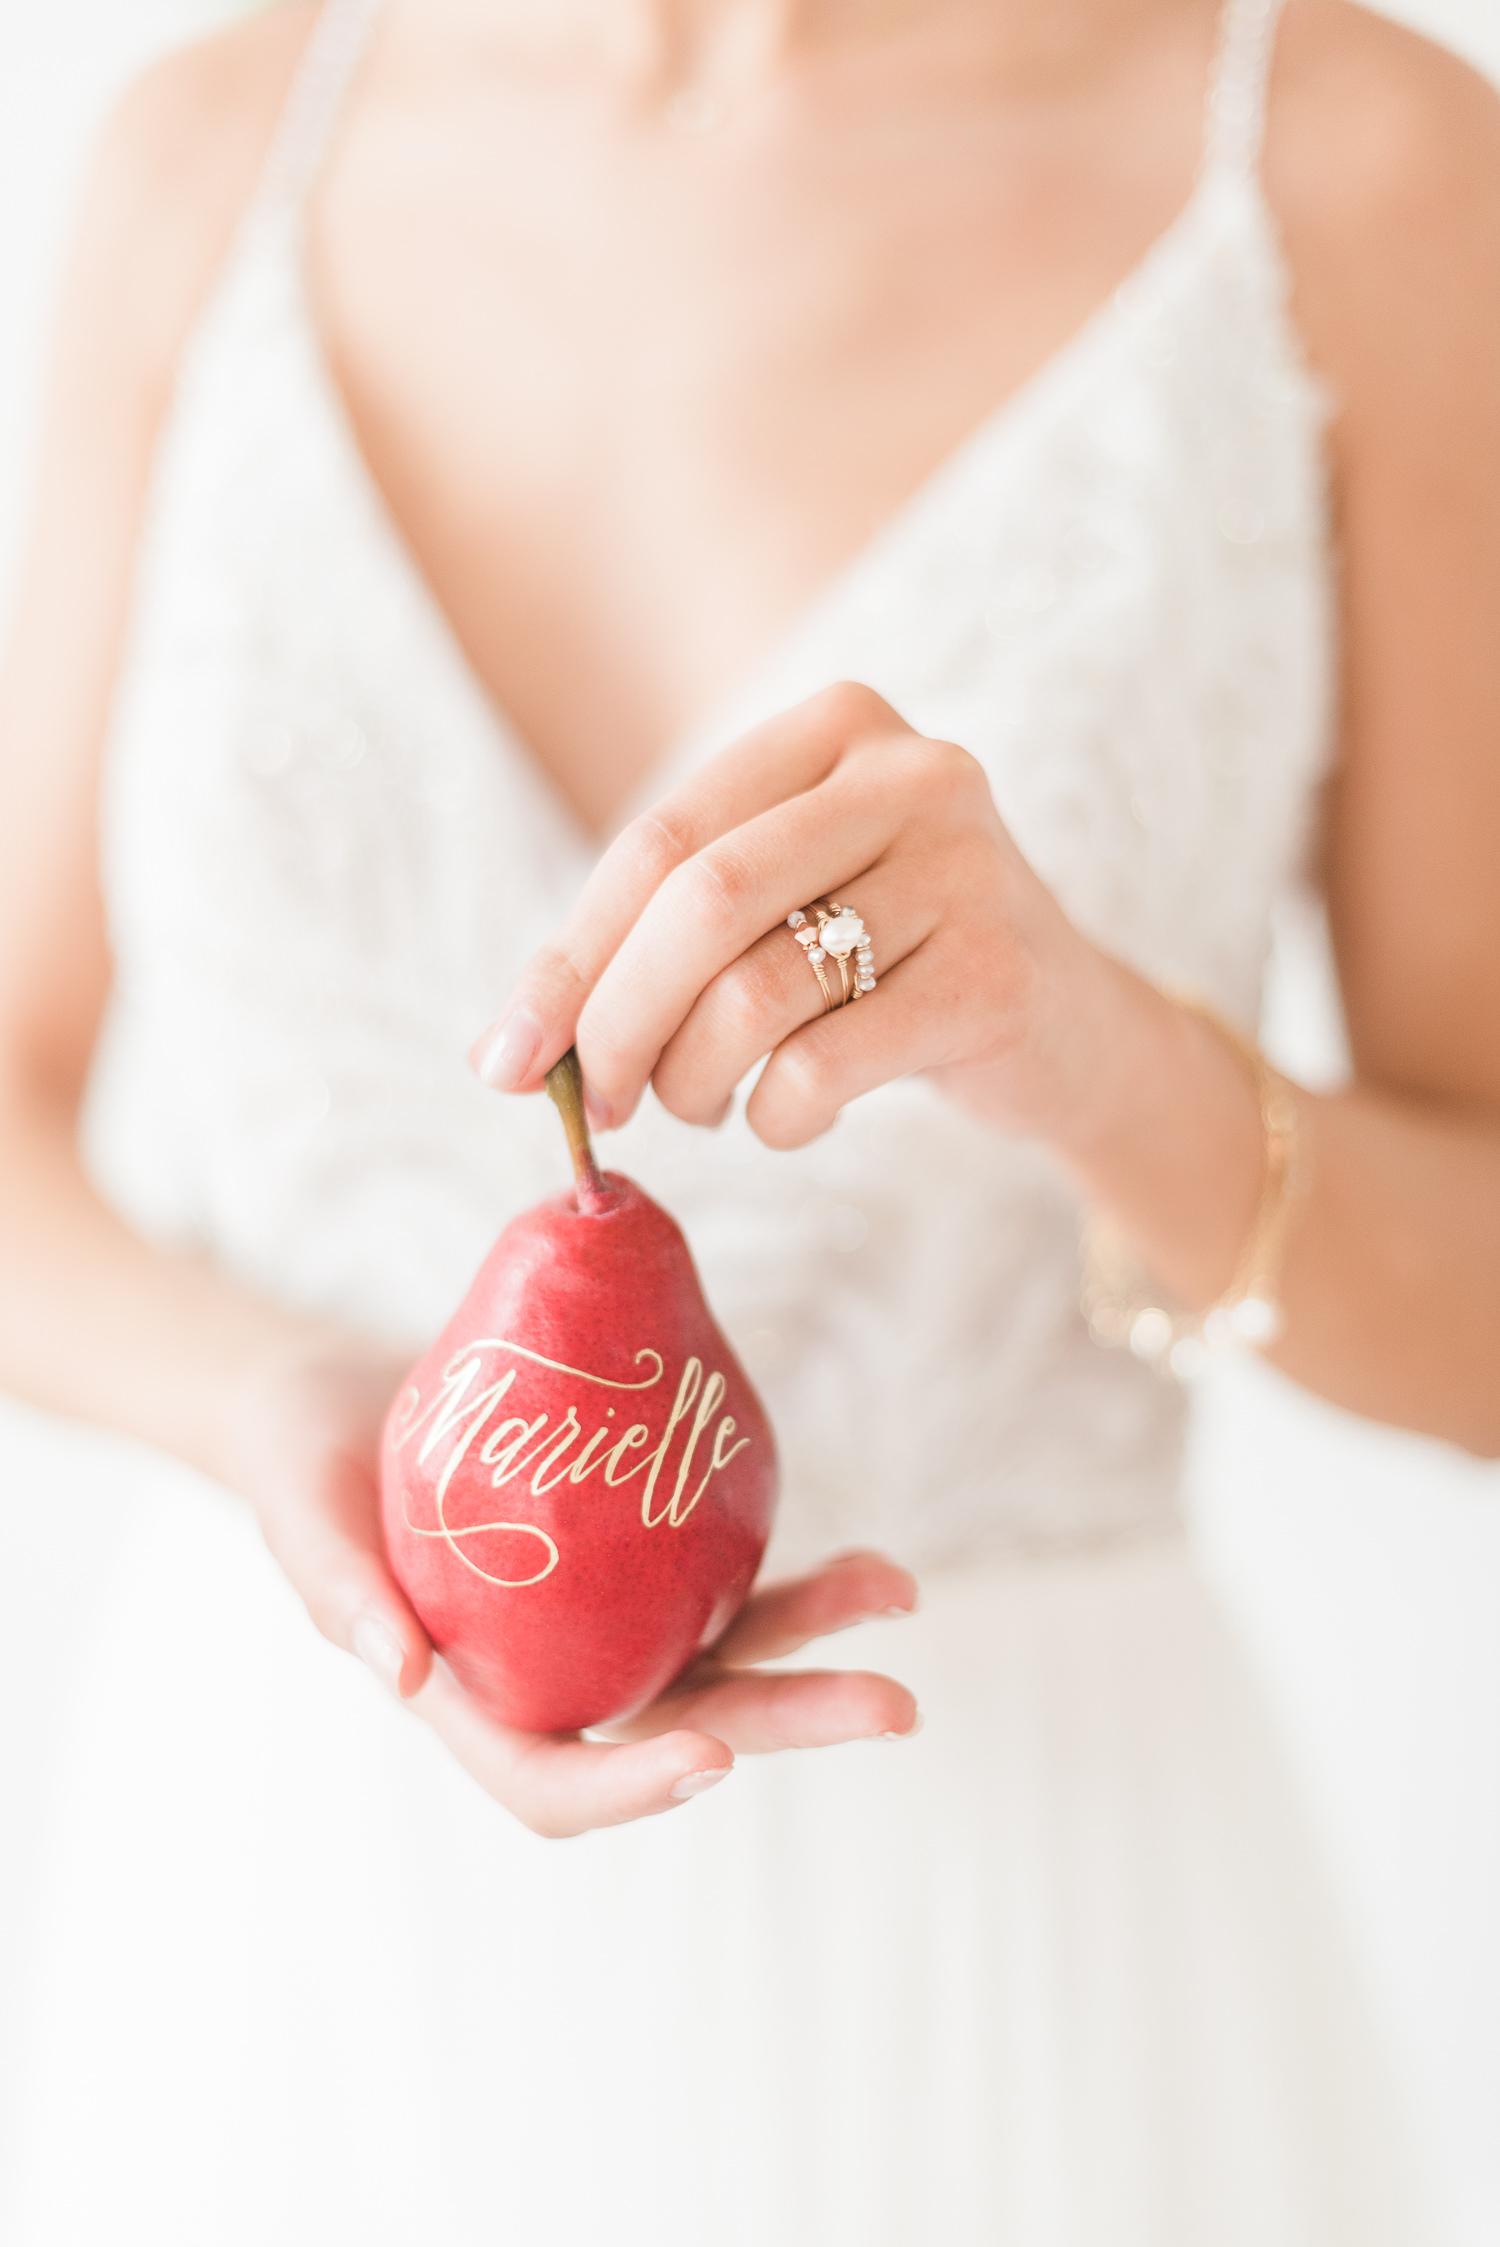 Pepstudios-Marriage-in-a-Pear-Tree-53.jpg